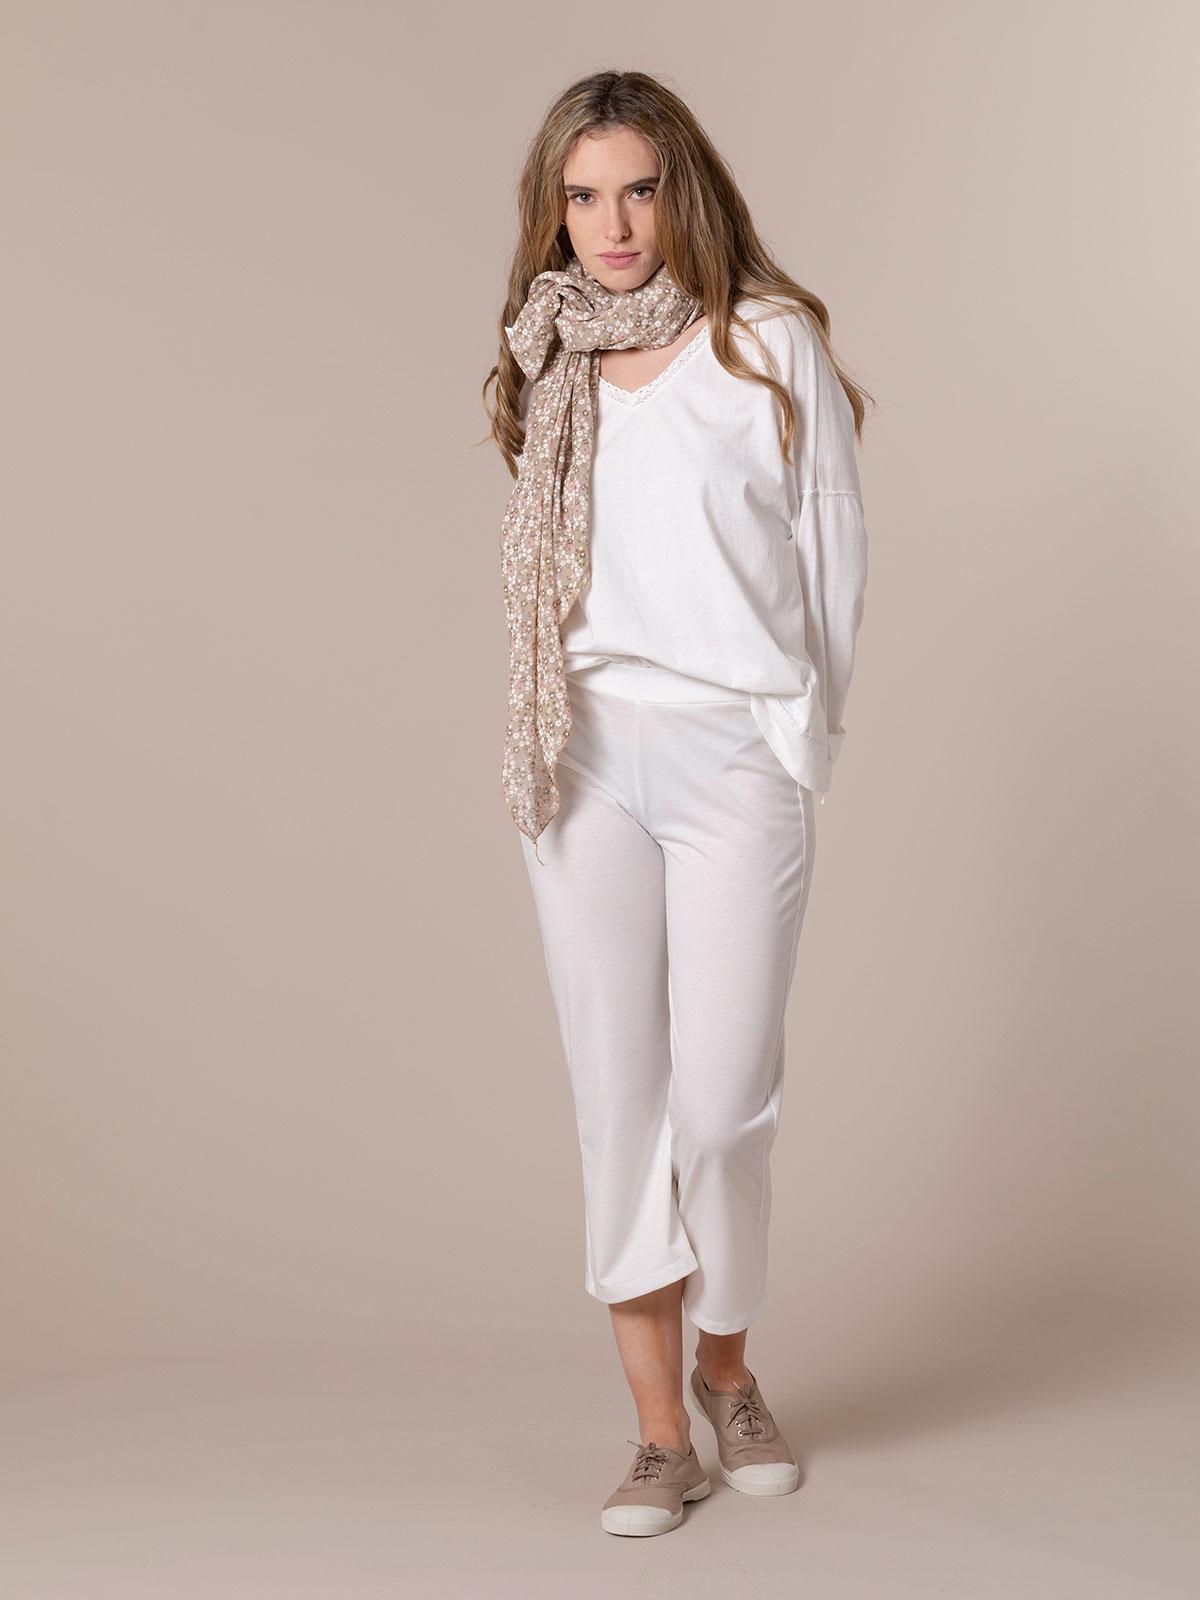 Fular mujer algodón florecita Beige